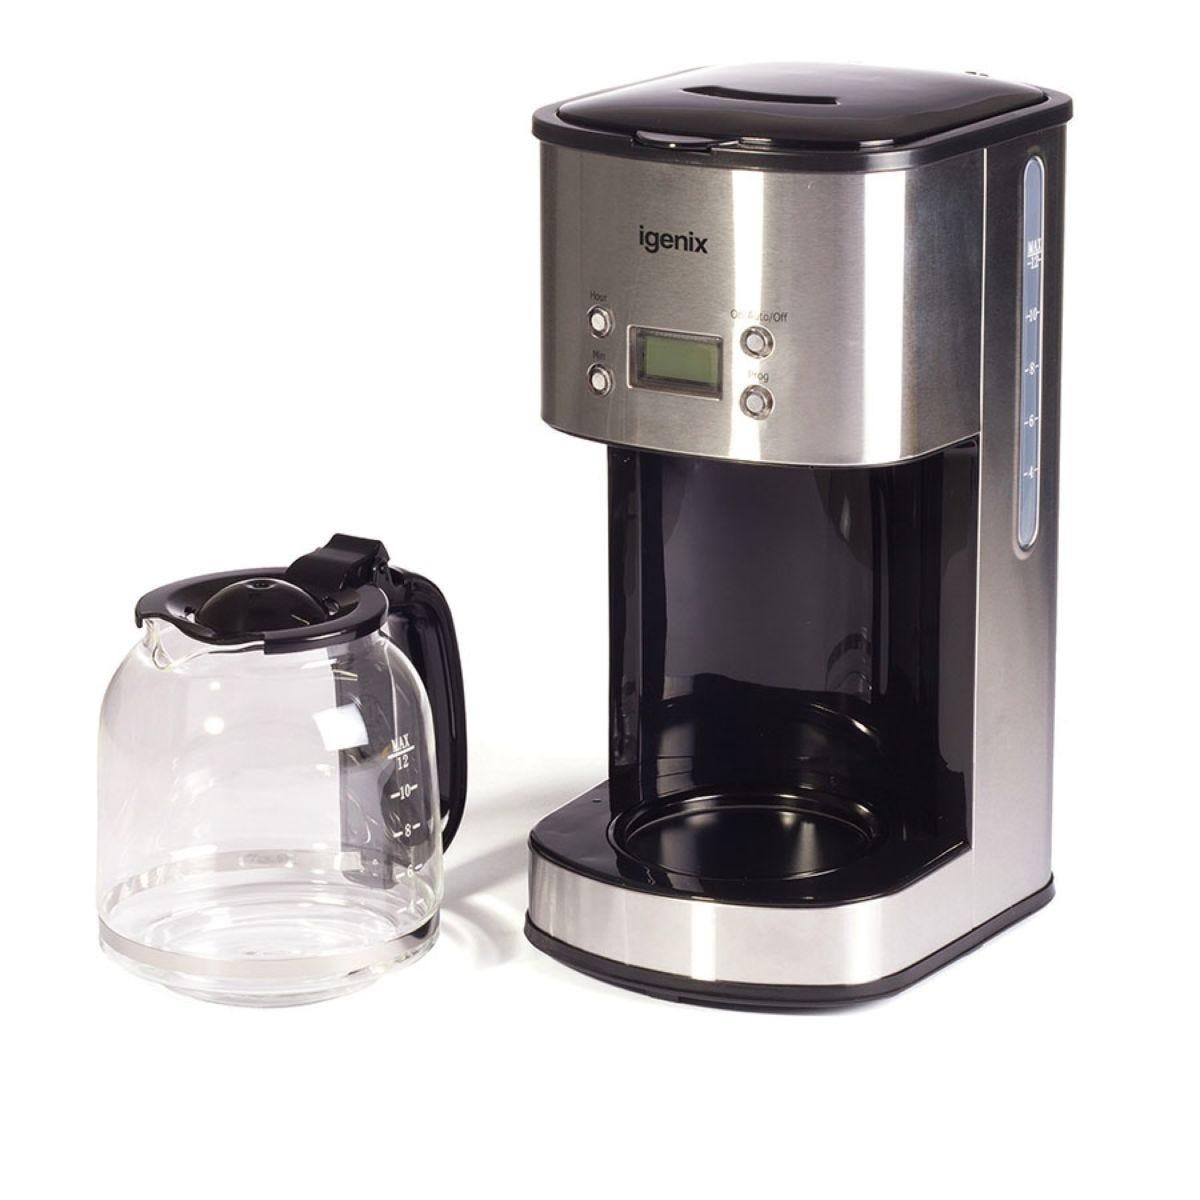 Igenix IG8250 1.5L Filter Coffee Maker – Stainless Steel